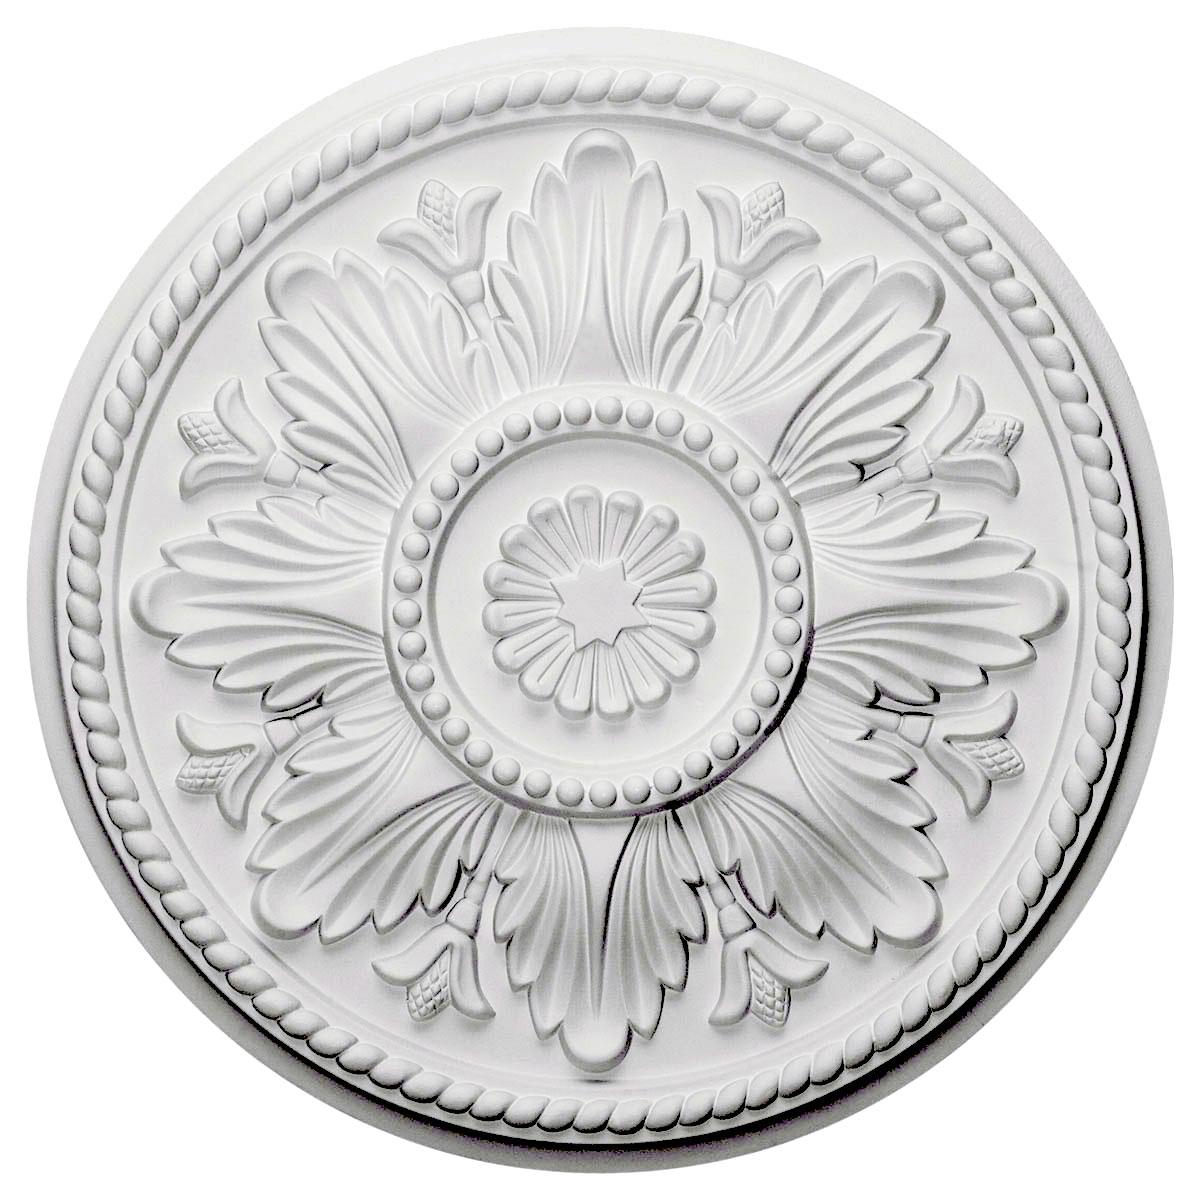 medallion medallions com large p ekena from split millwork buymbs ceiling